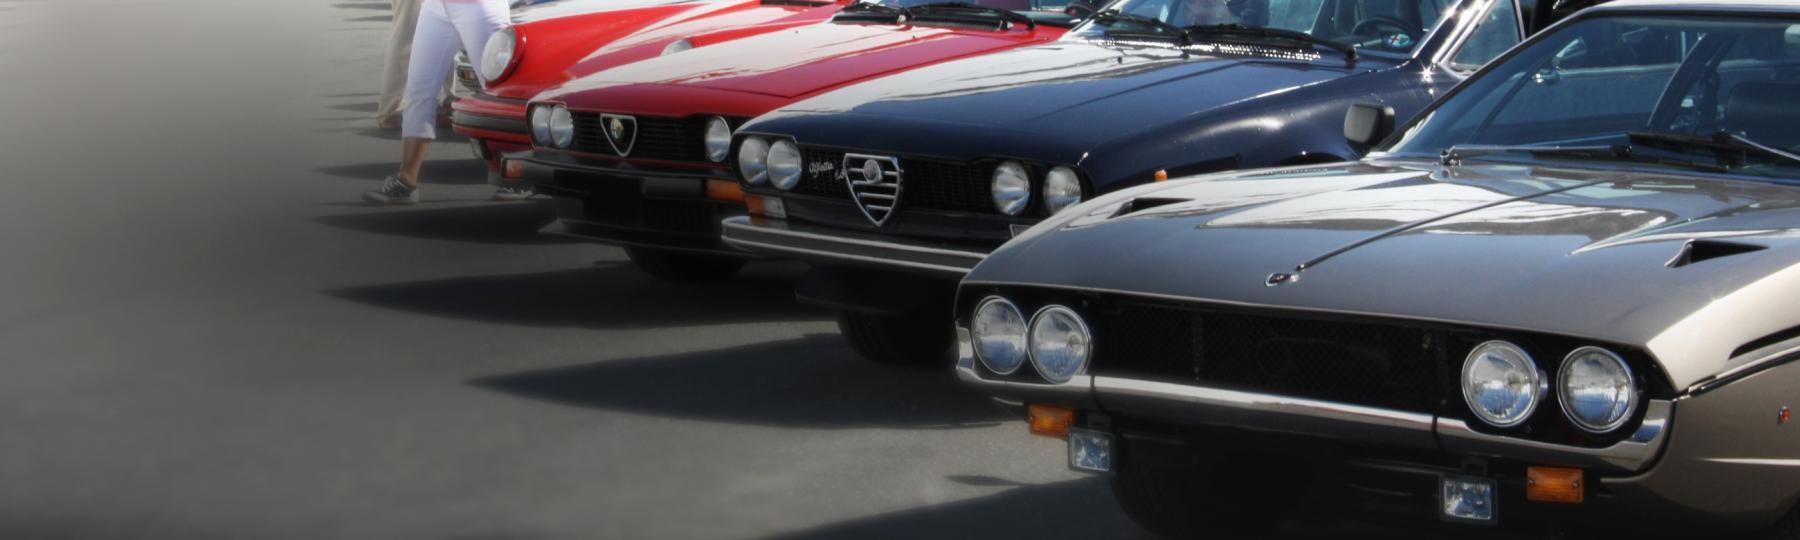 Eastern Europe modells Volga, Lada, Wartburg | Huseby Autodeler